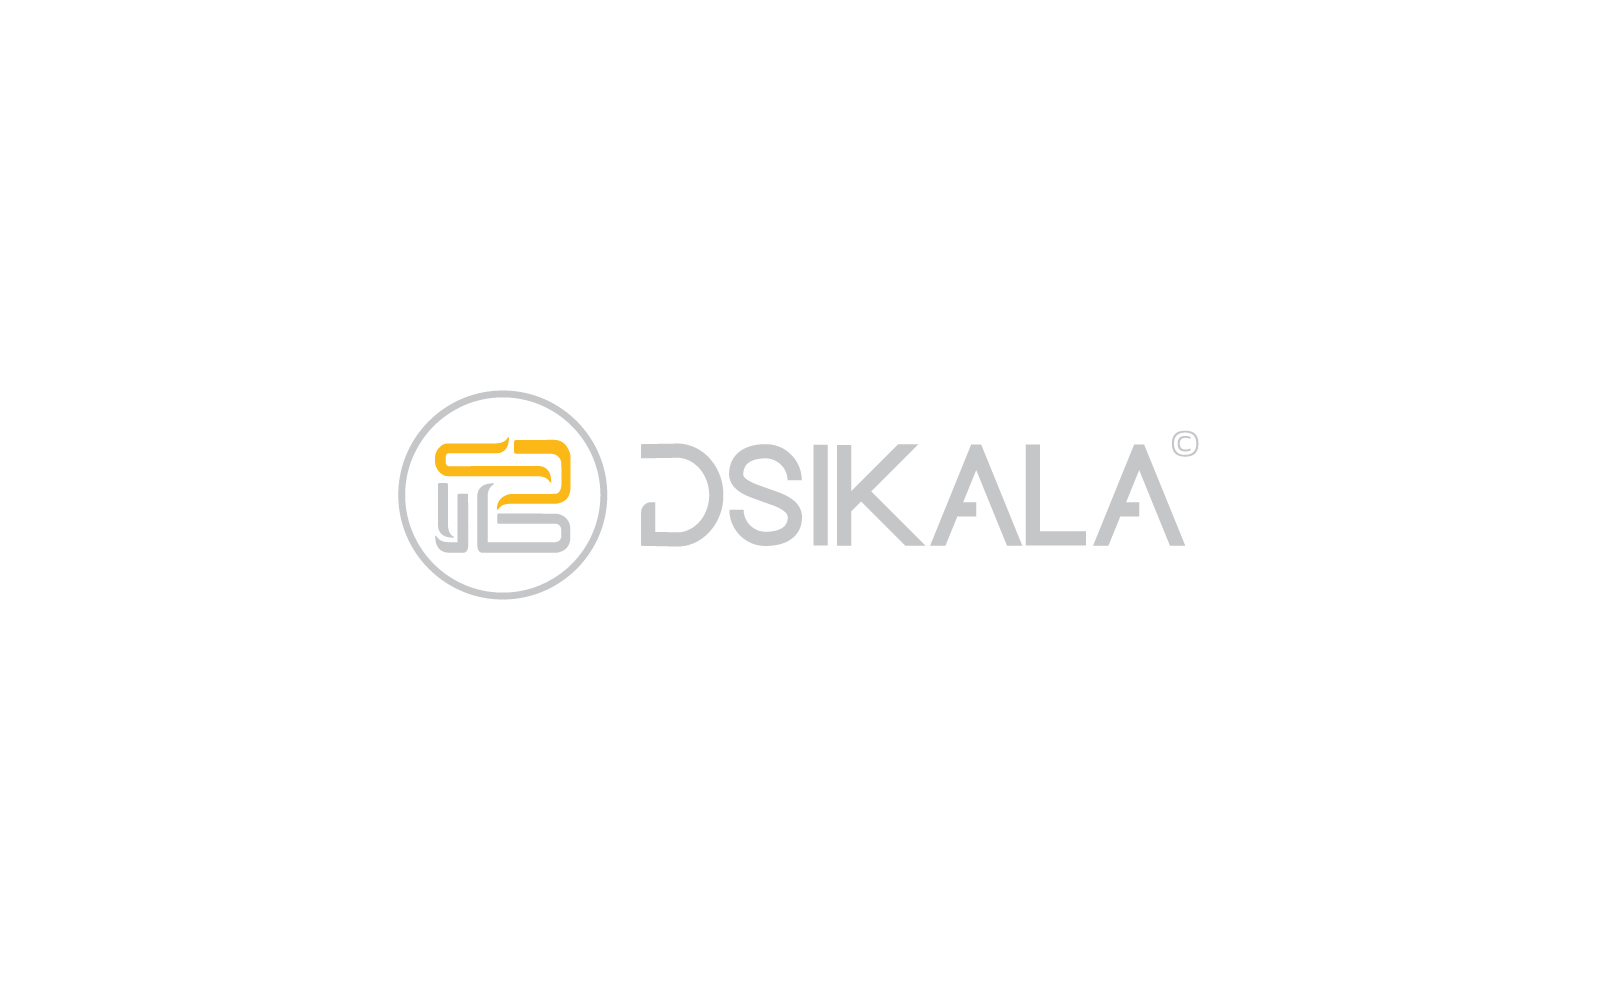 Dsikala- Add 6